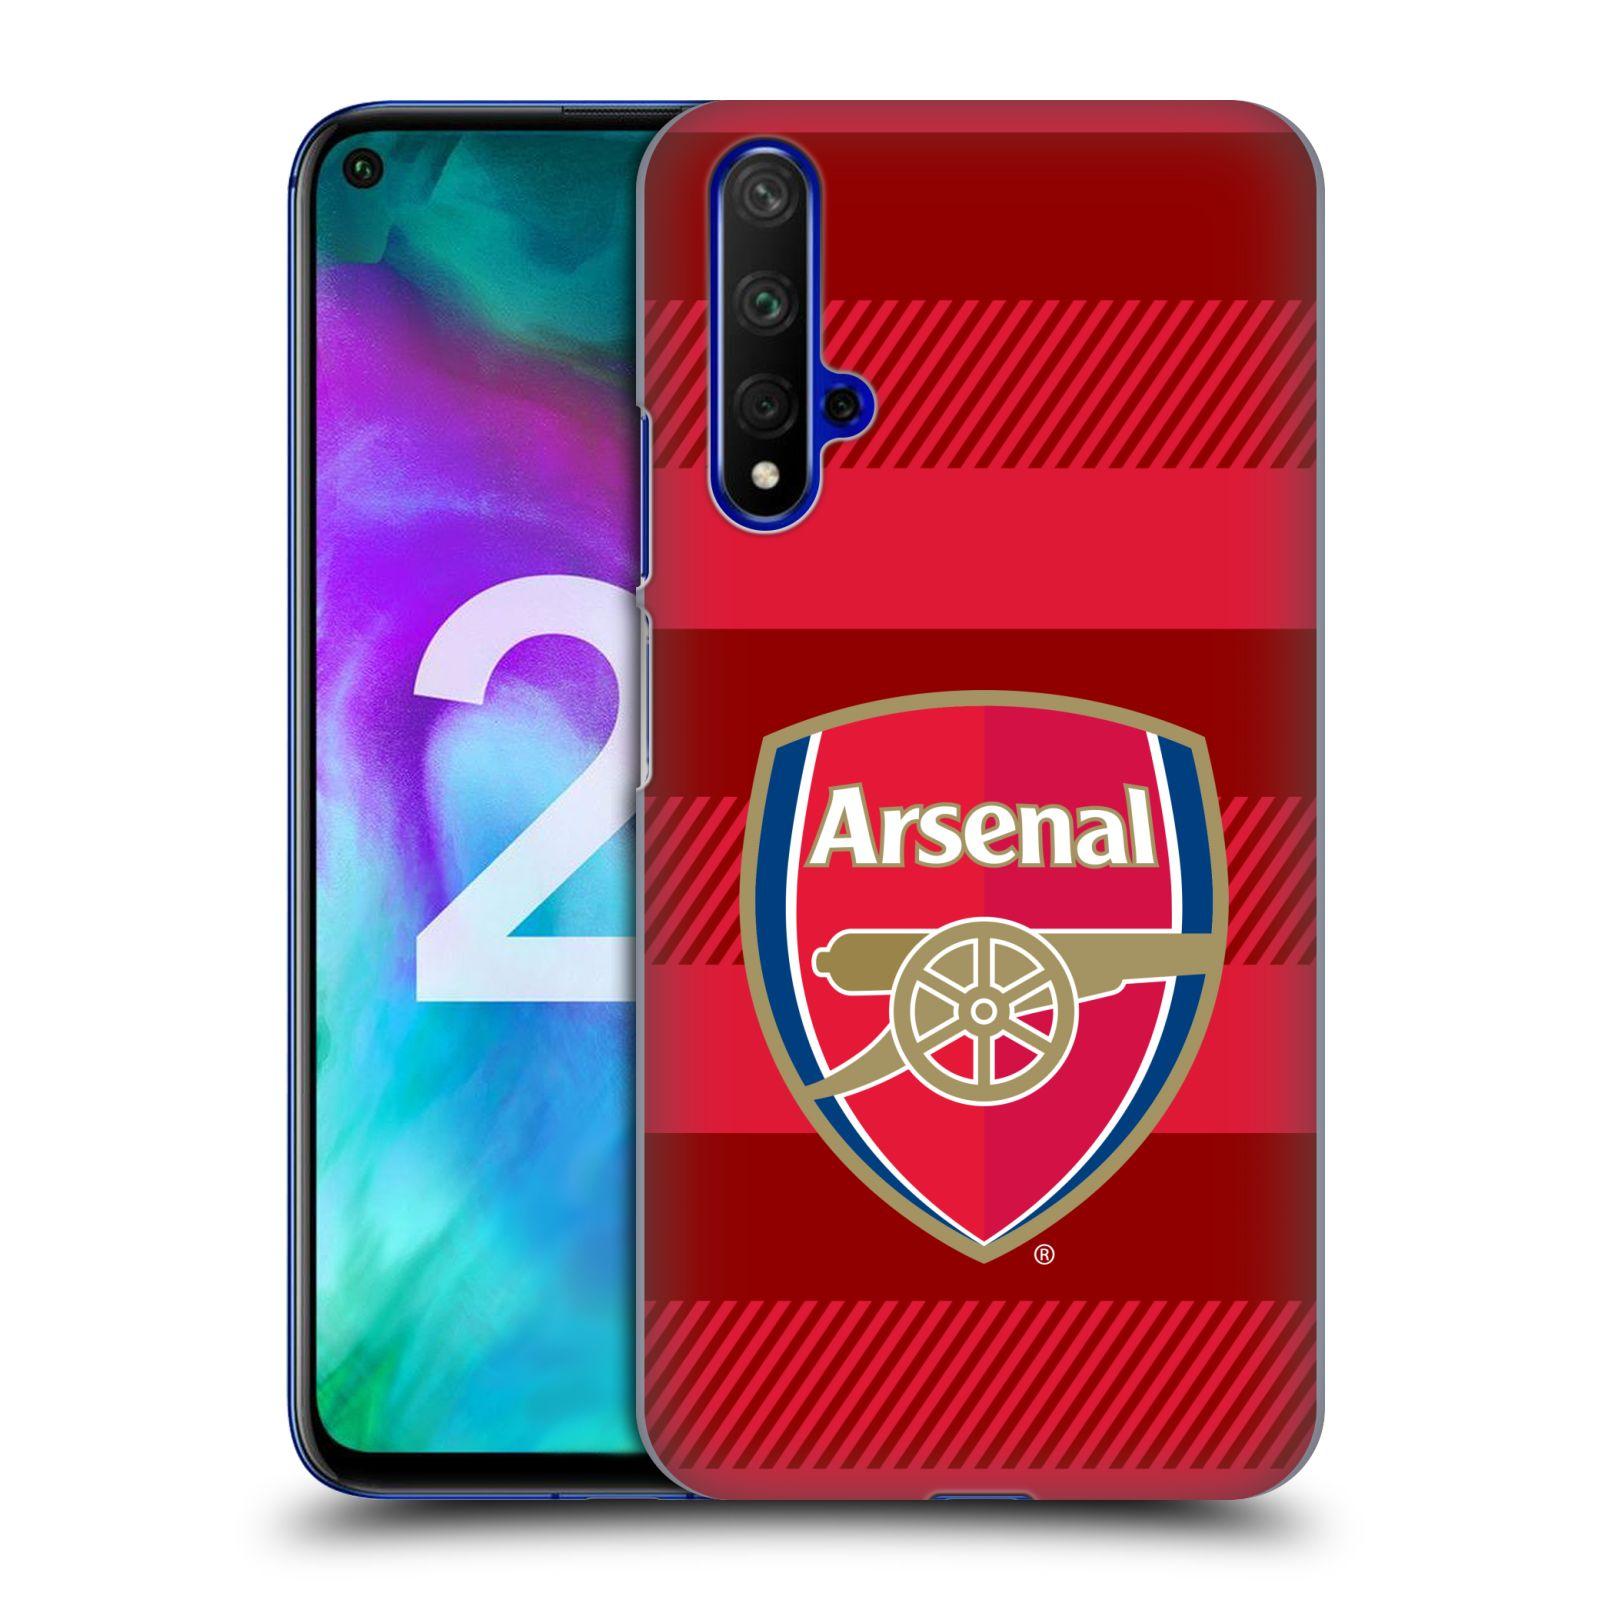 Plastové pouzdro na mobil Honor 20 - Head Case - Arsenal FC - Logo s pruhy